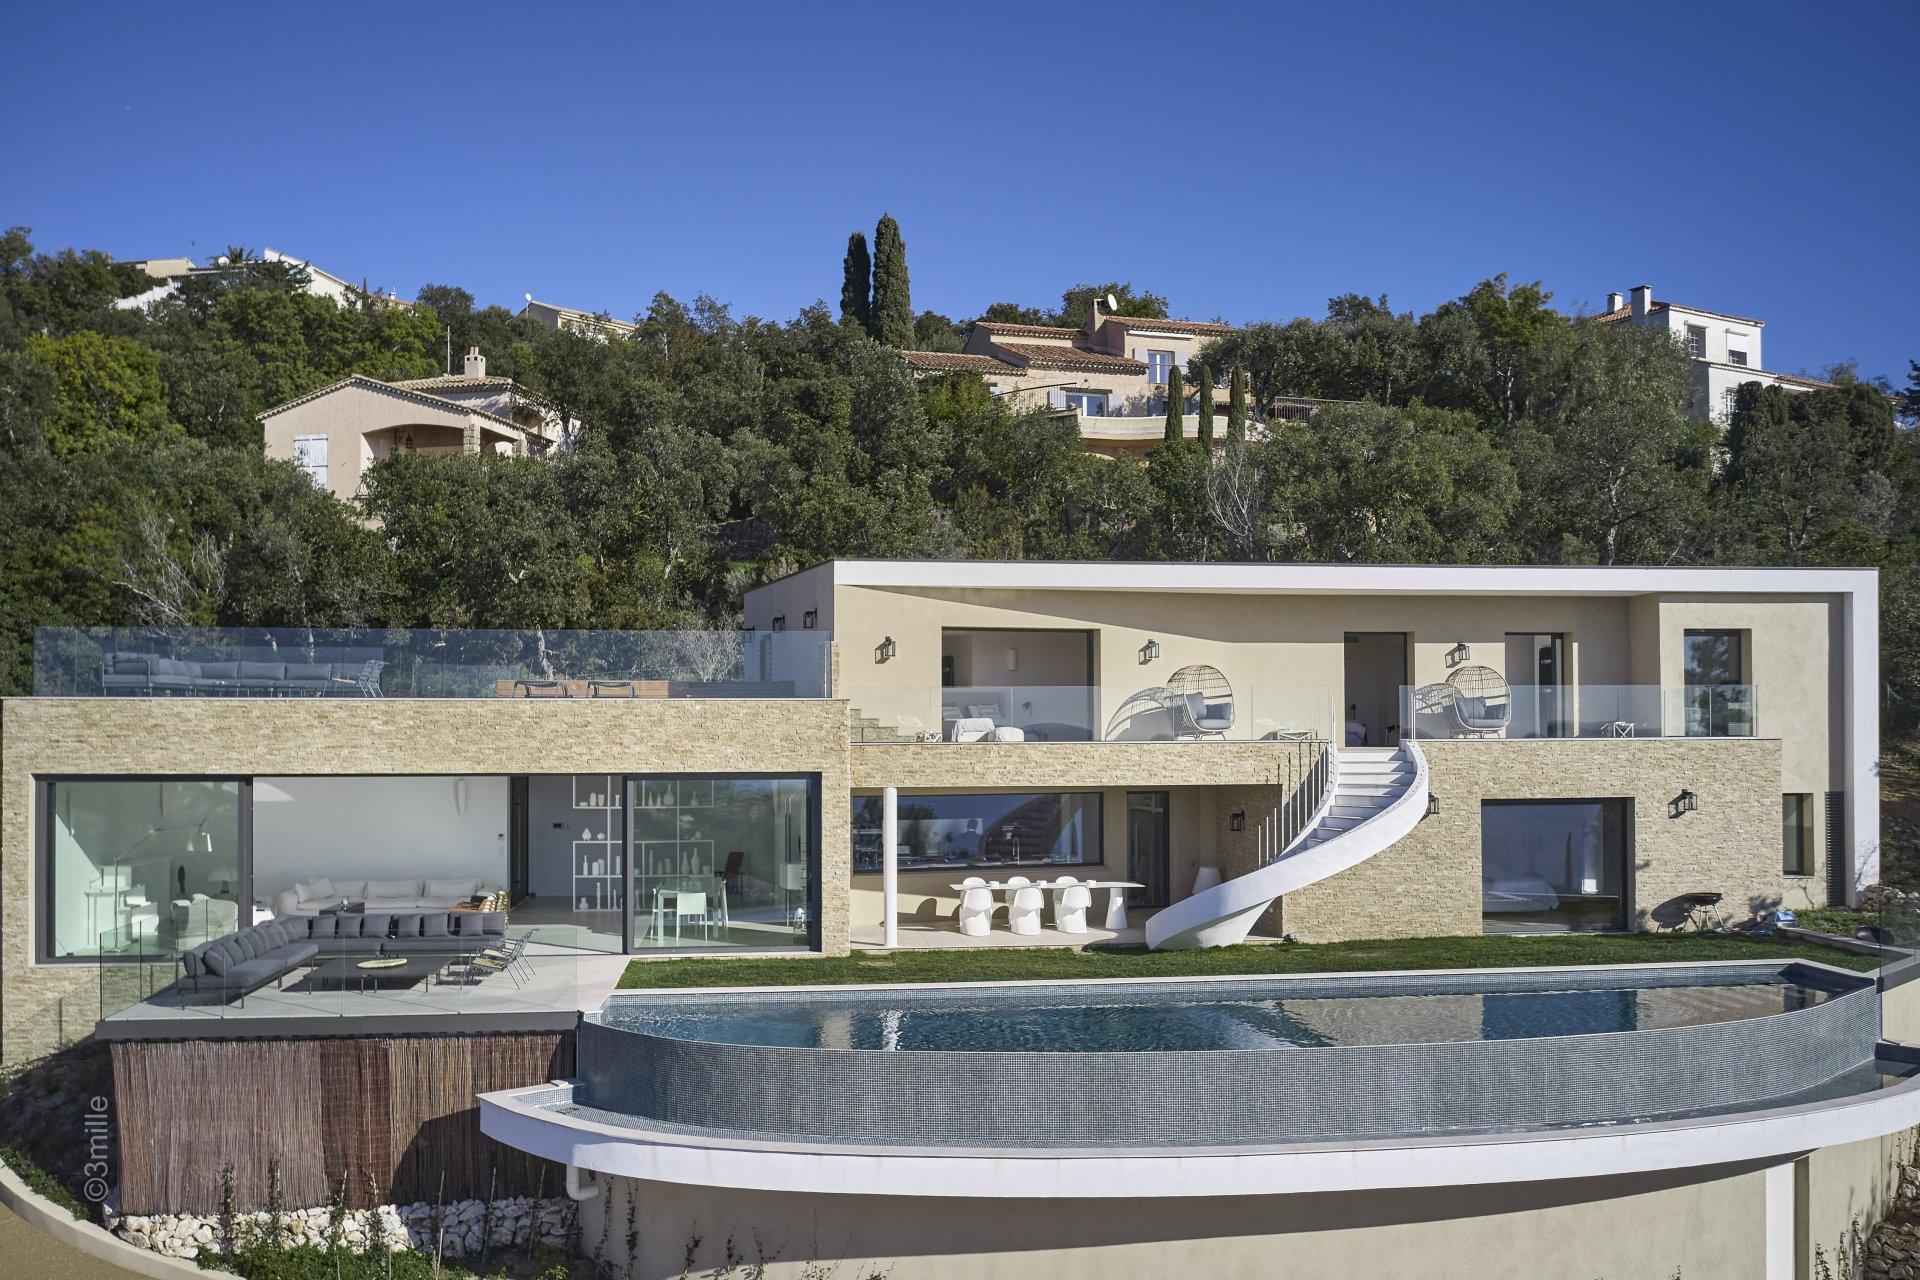 Les Issambres - New villa of + 300 m2 + GREAT SEA VIEW!